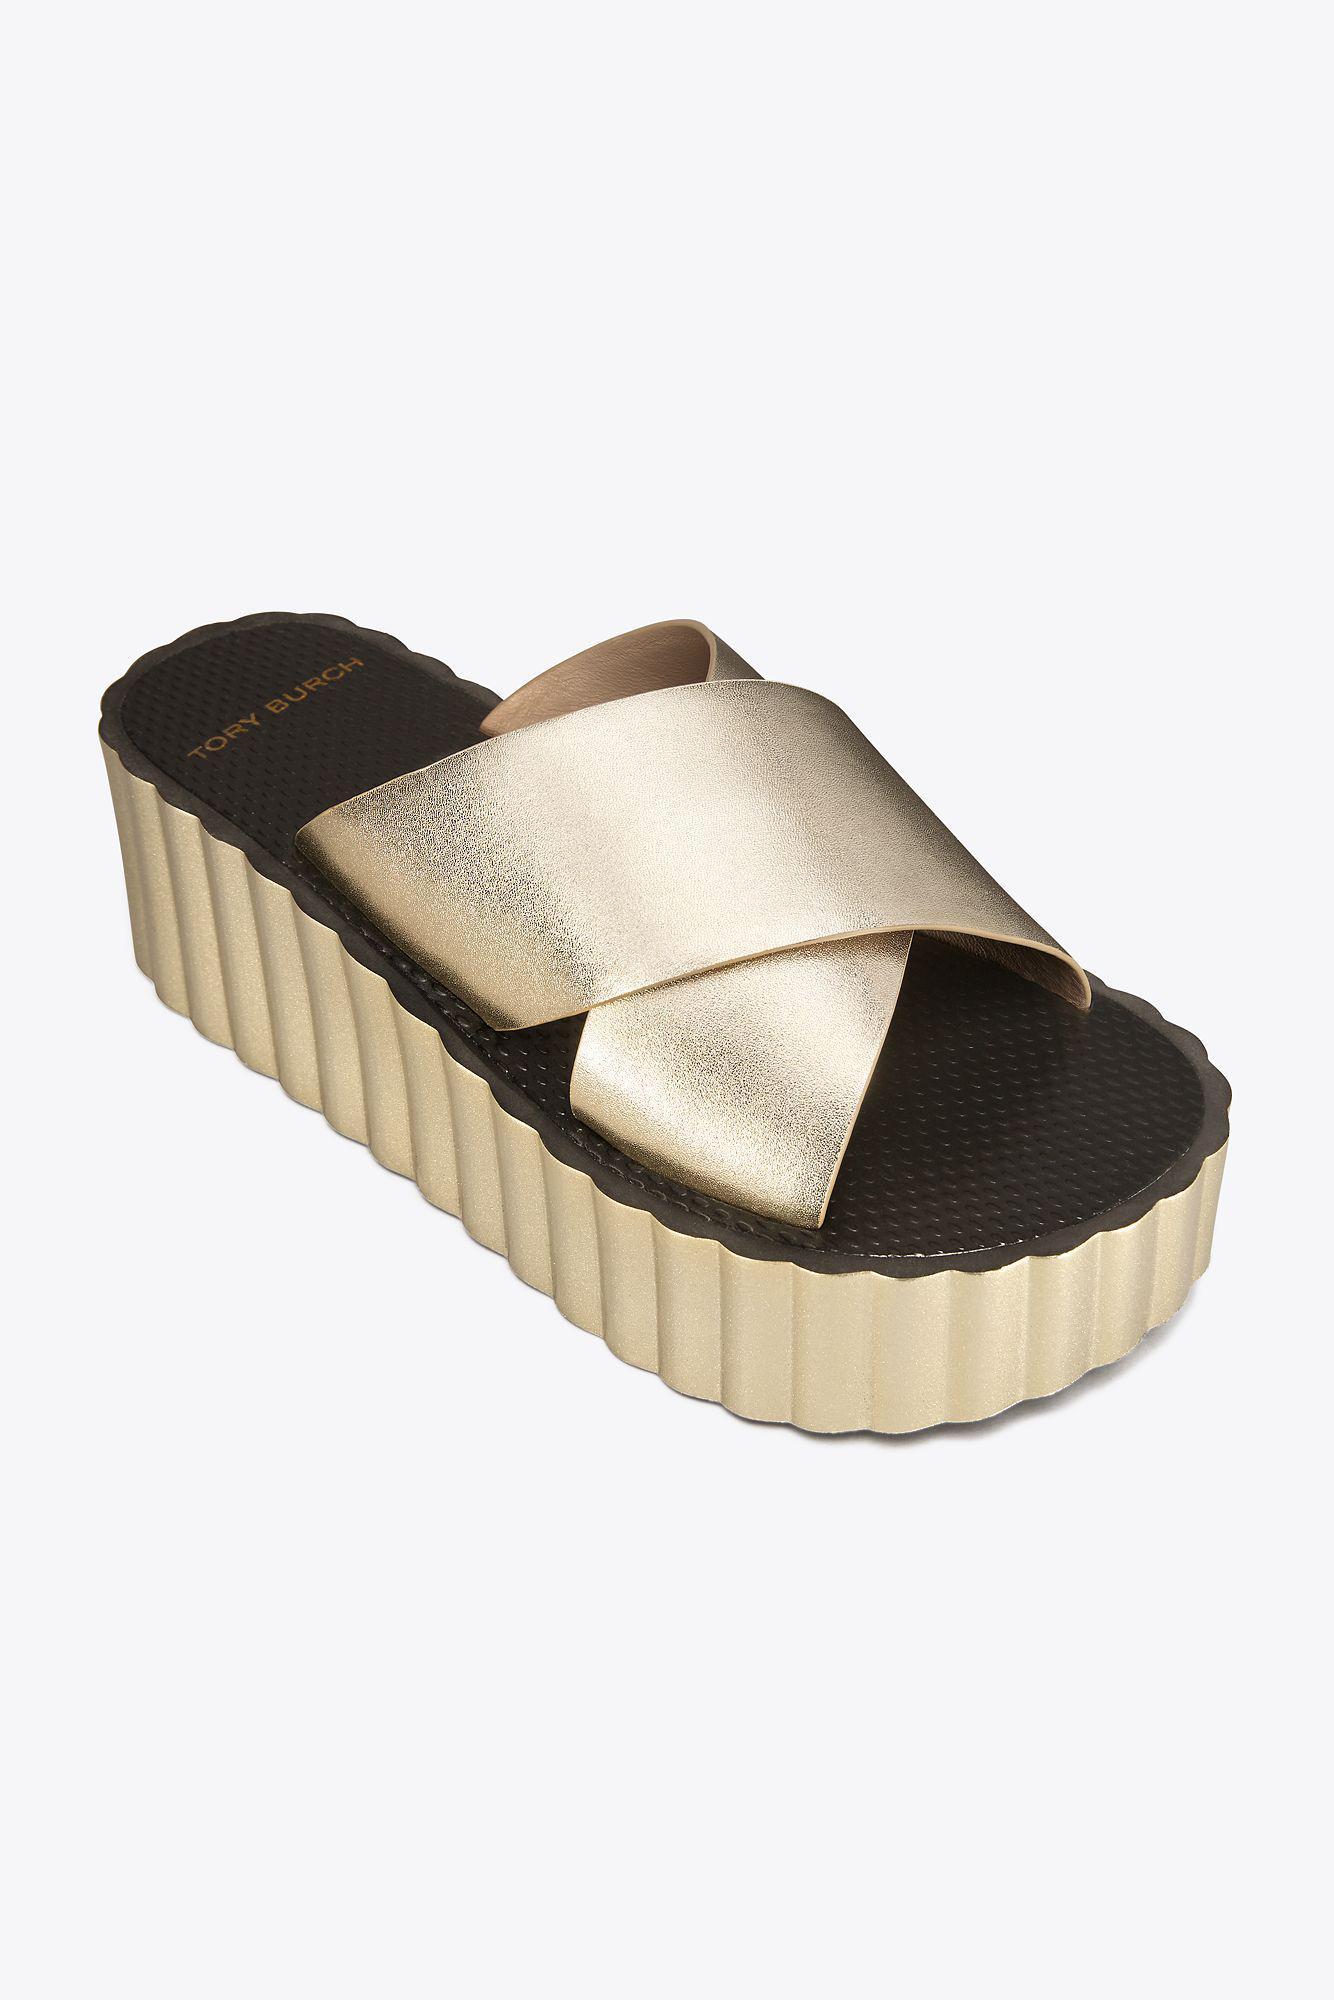 15f0d2ed0e1c Lyst - Tory Burch Scallop Wedge Leather Slide in Metallic